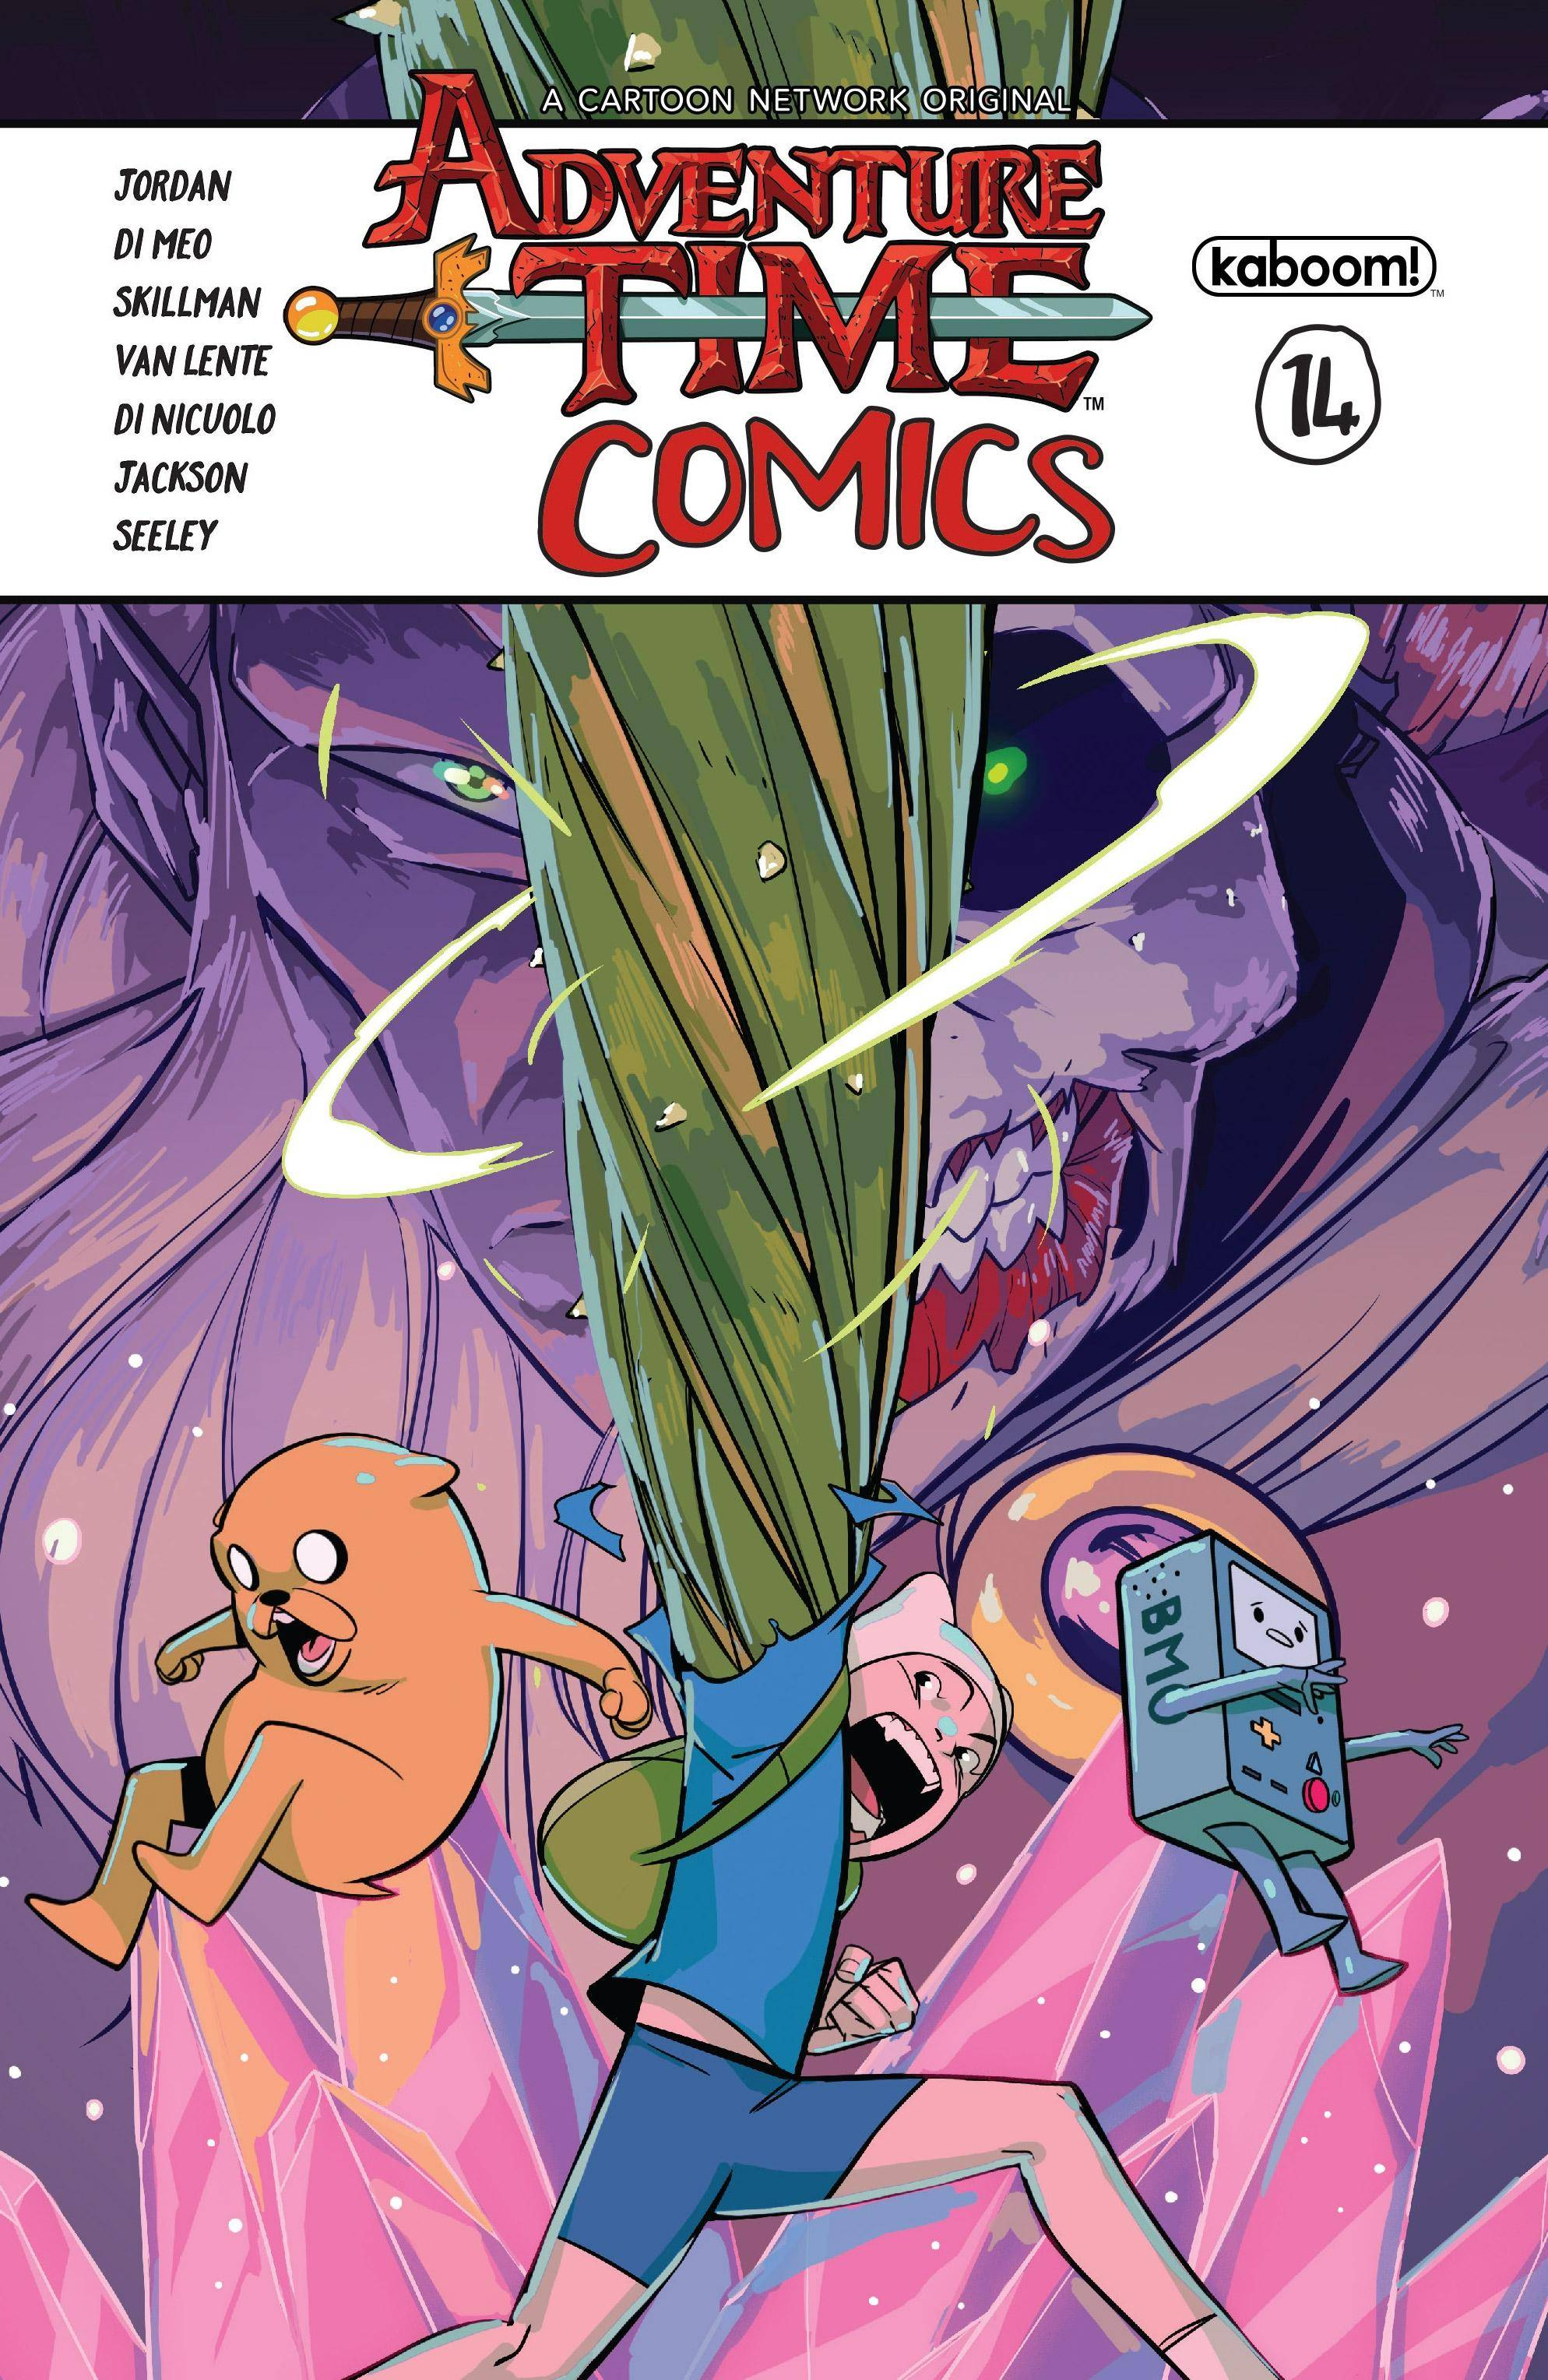 0-Day 2017 10 18 - Adventure Time Comics 014 2017 digital Salem-Empire cbr